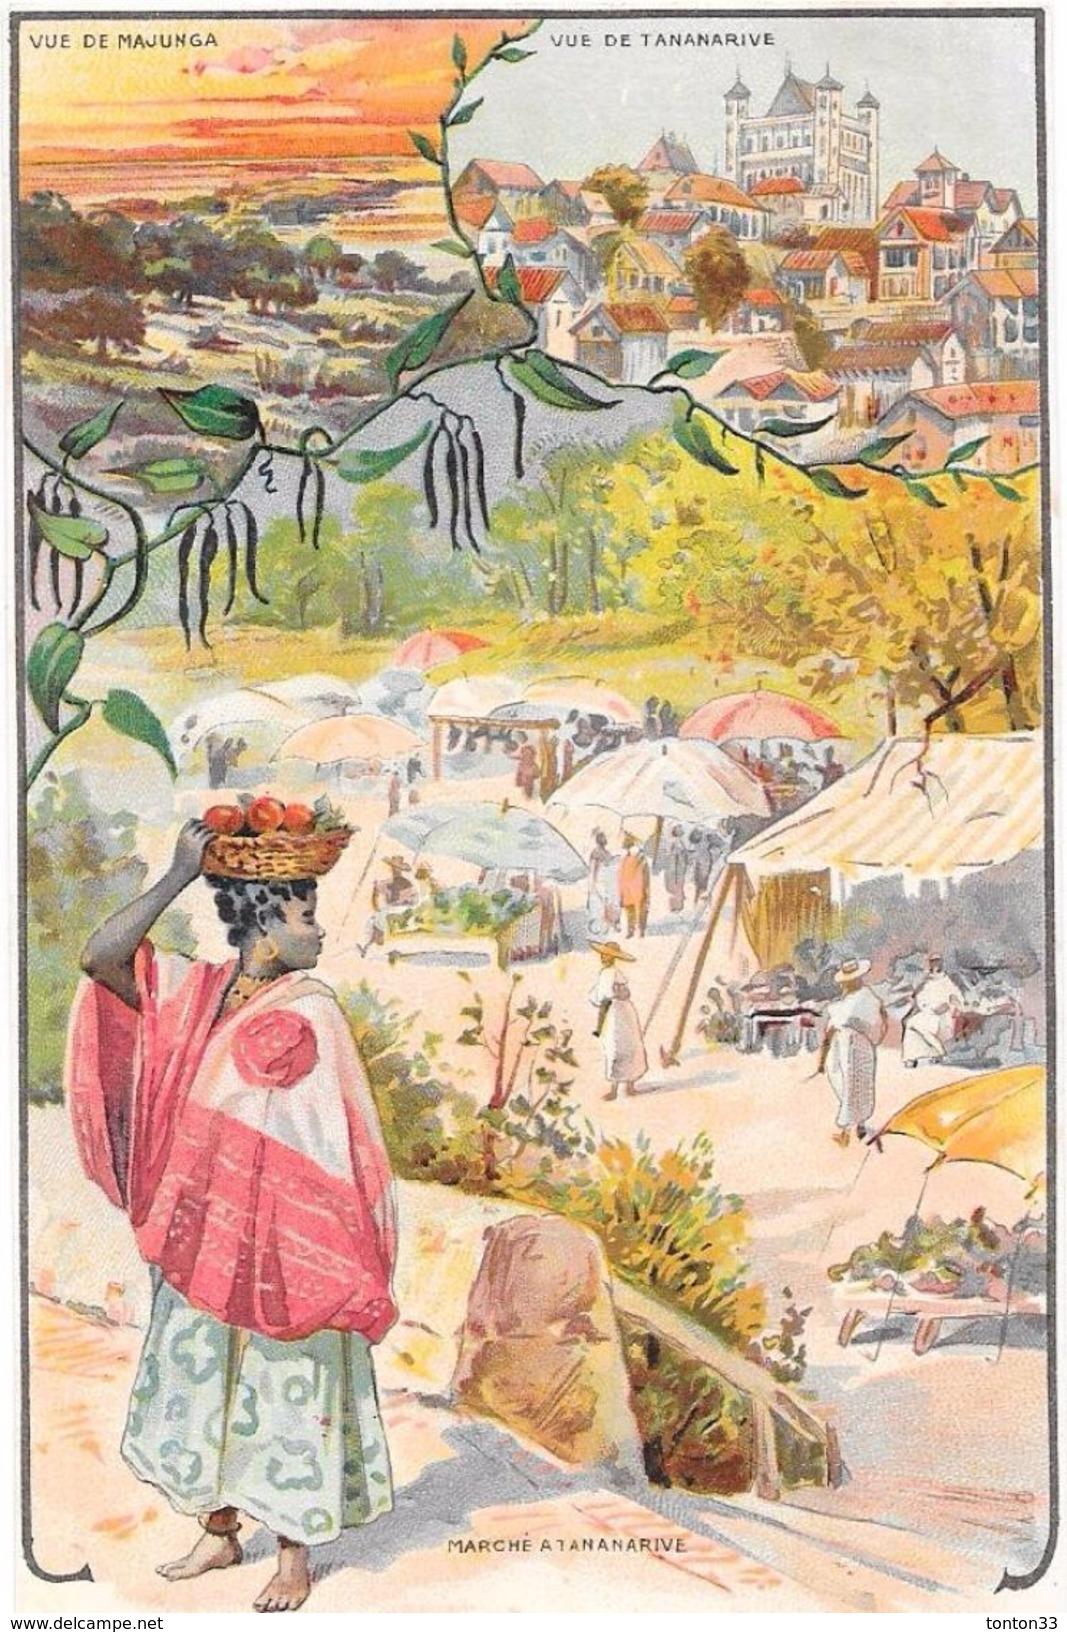 ANGERS - 49 - PUB BELLE JARDINIERE Succursale D'ANGERS - Nos Colonies Madagascar - ENCH2906/321 - - Angers